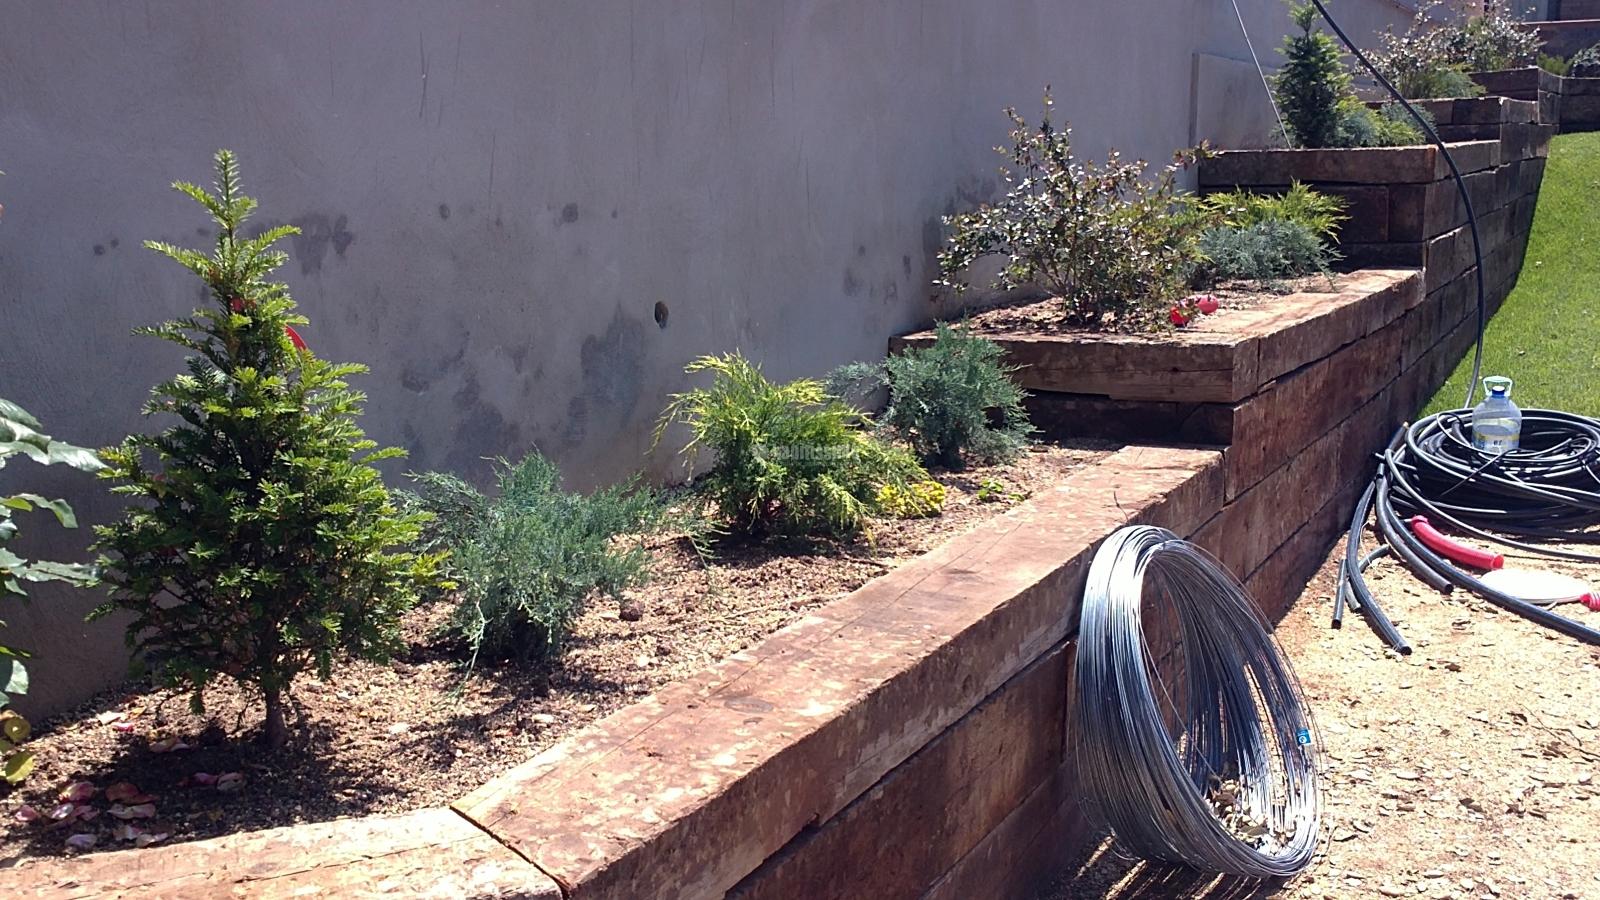 Foto construcci n traviesa tren jard n de fusta i jardi - Traviesas de tren para jardin ...